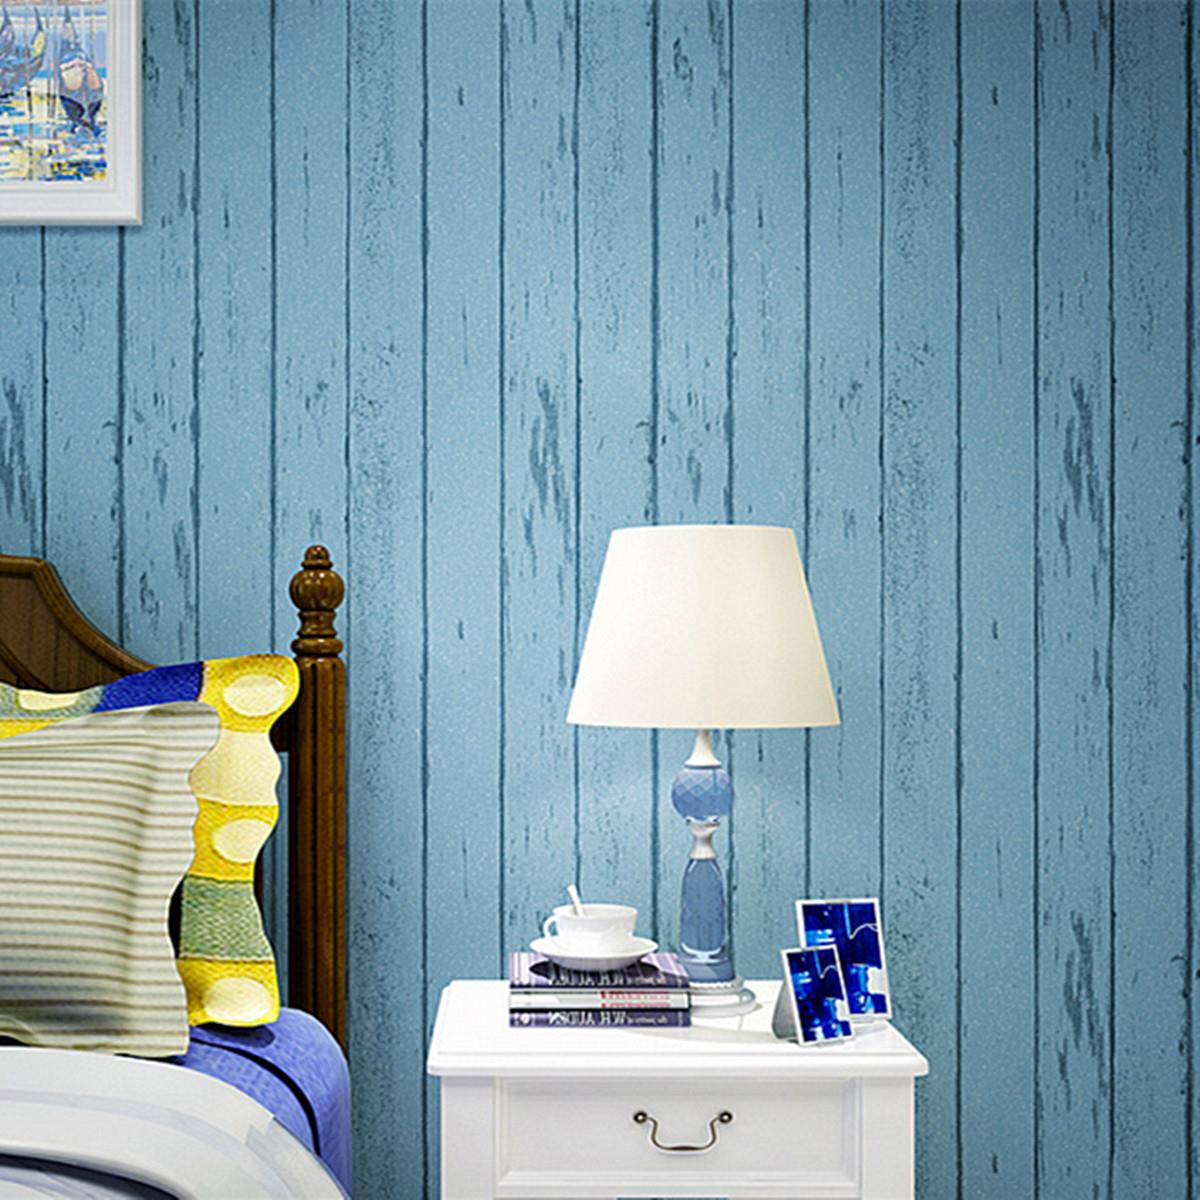 Wallpaper Wood Grain For Walls Blue White Striped Non Woven Bedroom Tv Background Living Room Modern